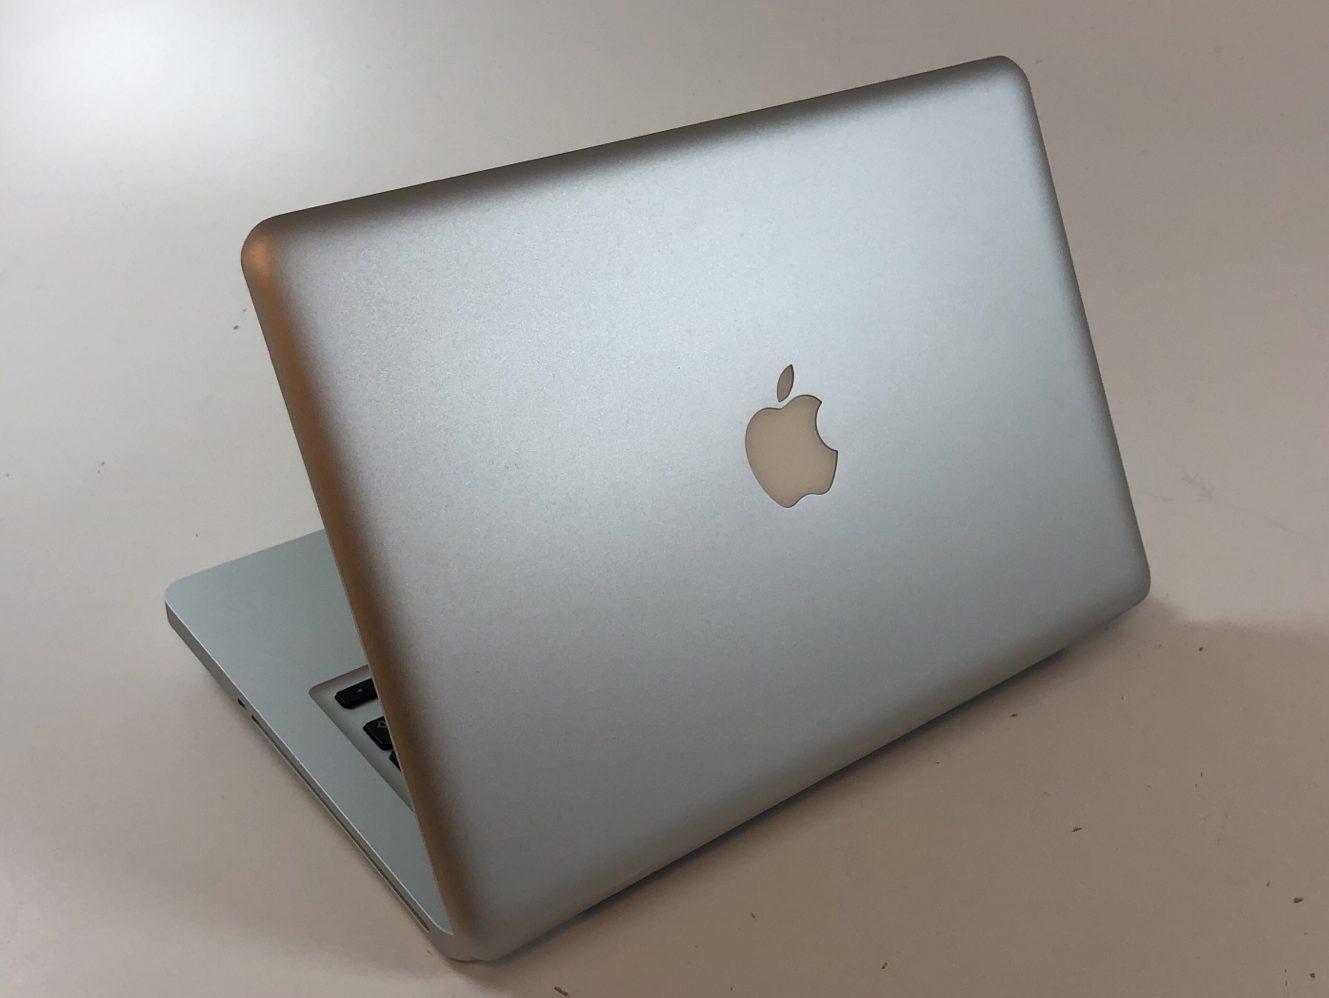 "MacBook Pro 13"" Early 2011 (Intel Core i5 2.3 GHz 4 GB RAM 500 GB HDD), Intel Core i5 2.3 GHz, 4 GB RAM, 500 GB HDD, bild 2"